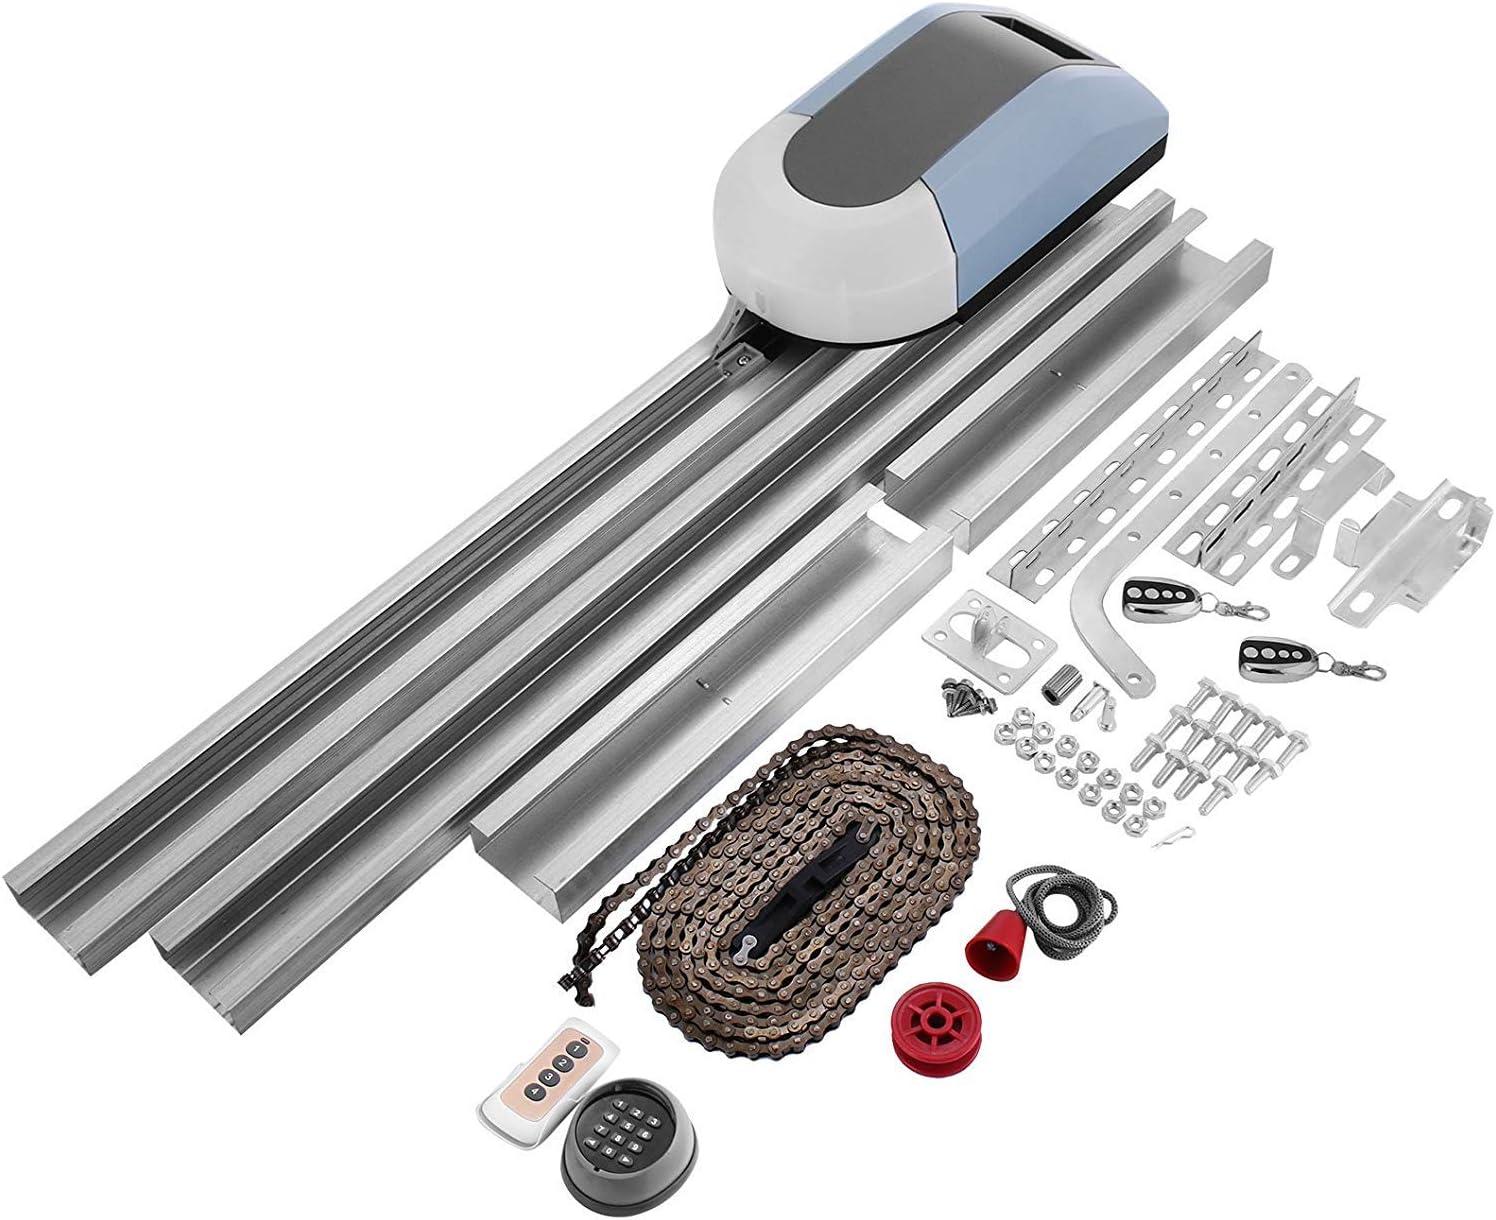 ZGYQGOO Kit Apertura Puerta Garaje Kit Apertura Puerta 1000N Abridor Puerta corredera automática 120 mm/s con 2 Controles remotos inalámbricos (1000N): Amazon.es: Hogar